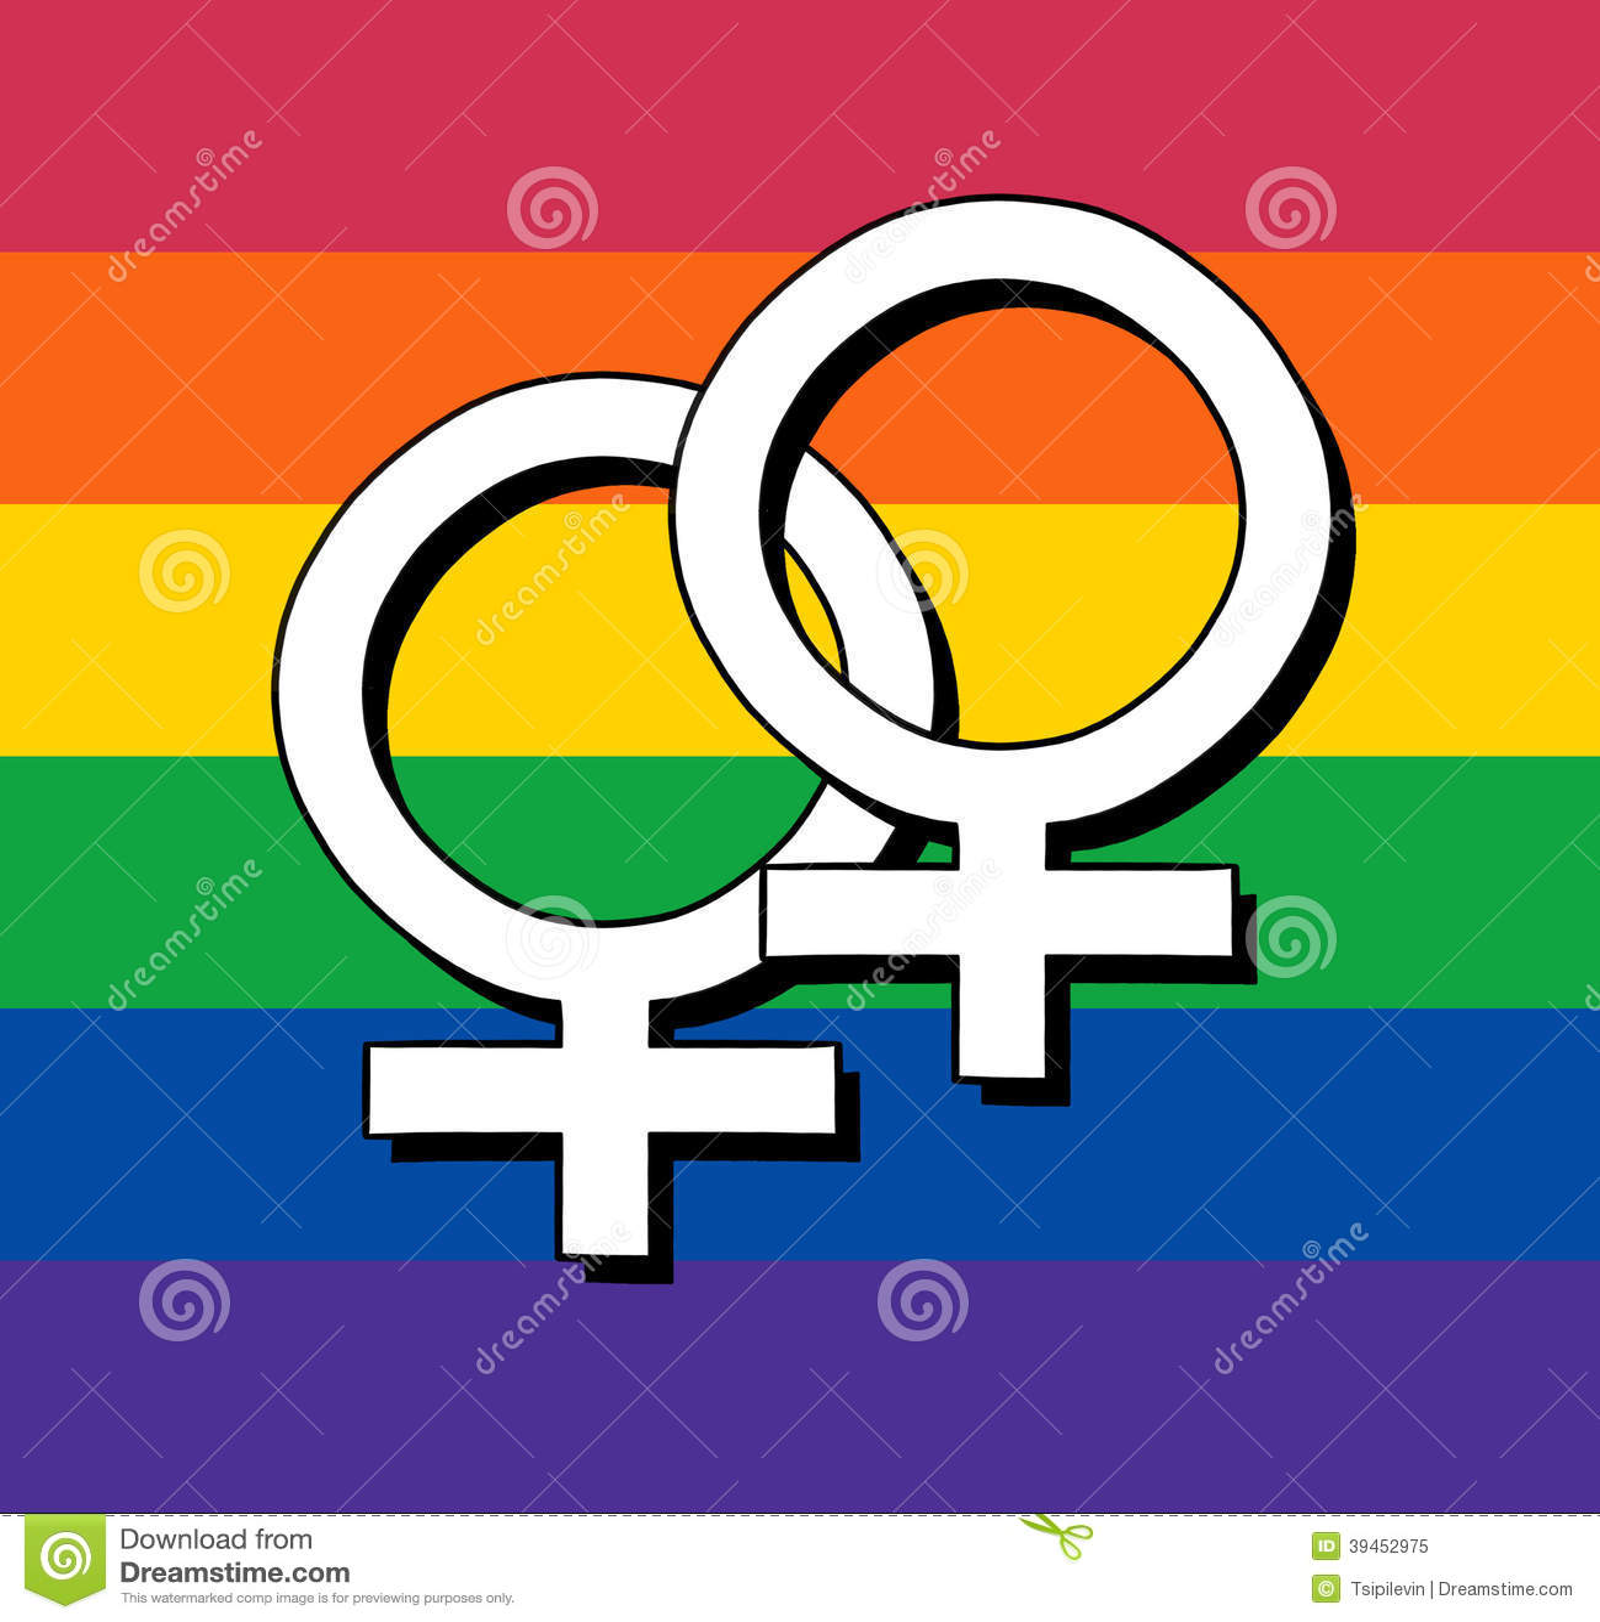 Gay flag with female symbol stock illustration illustration of gay flag with female symbol buycottarizona